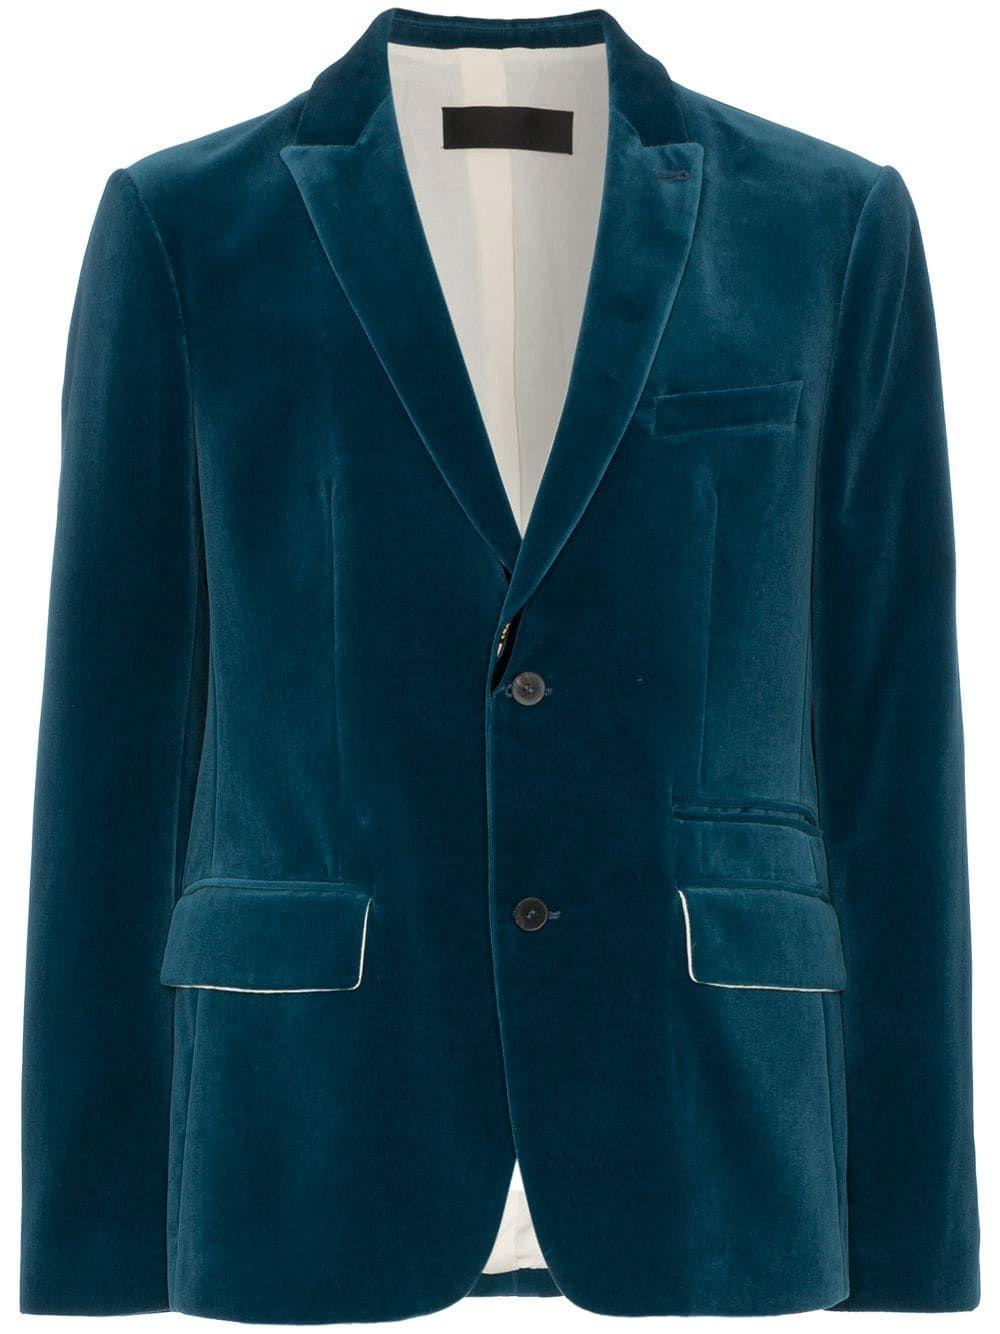 3d5f2c16d Haider Ackermann Velvet Suit Jacket - Blue in 2019 | Products ...